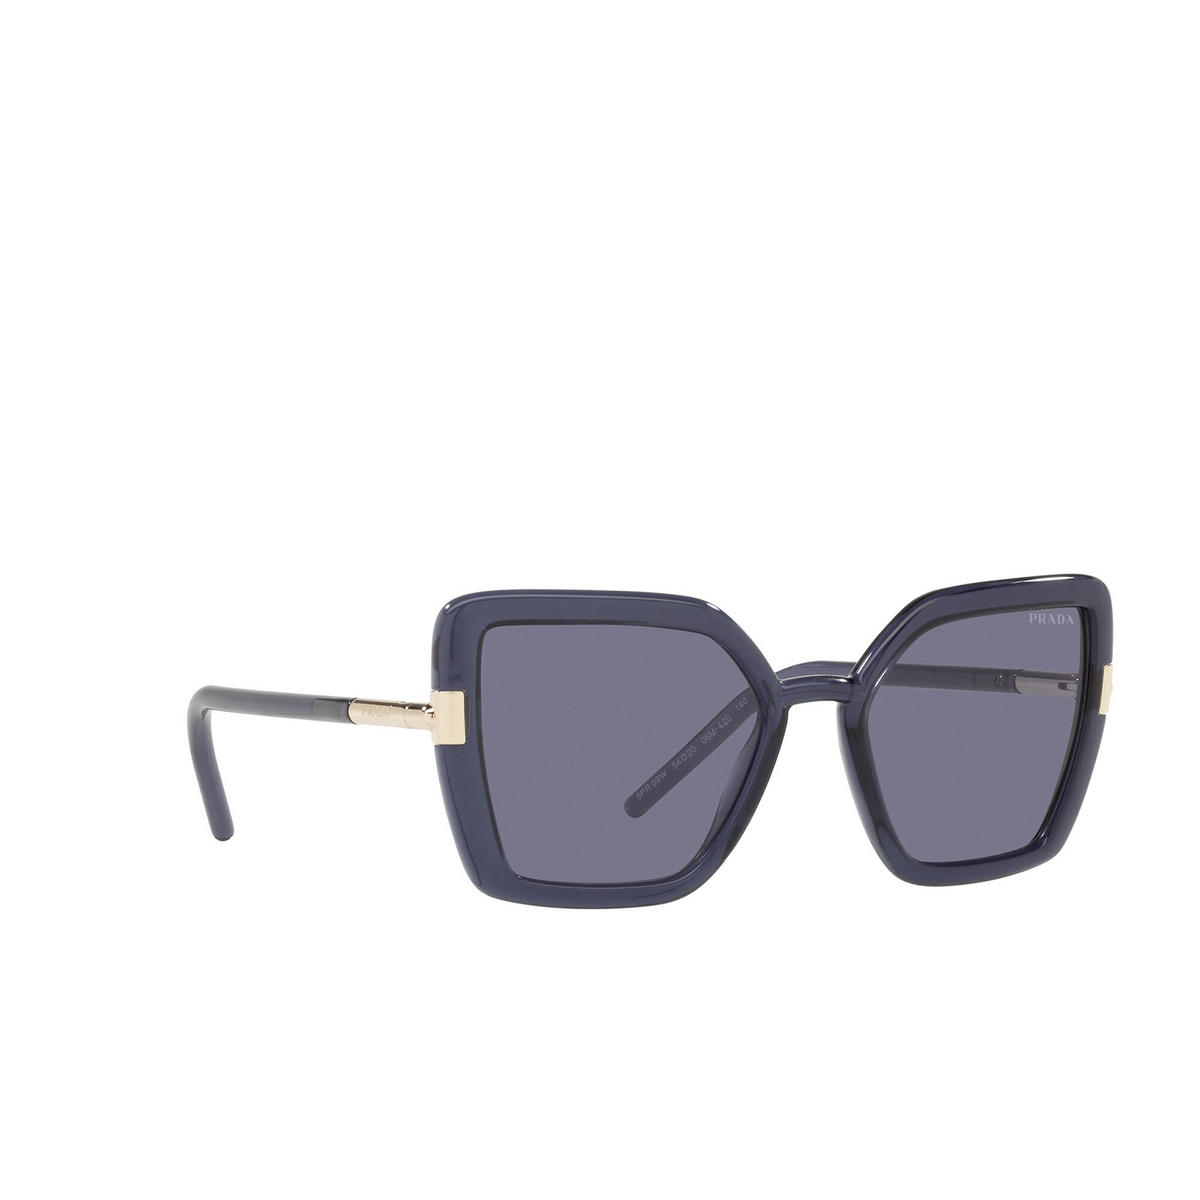 Prada® Butterfly Sunglasses: PR 09WS color Crystal Bluette 06M420 - three-quarters view.